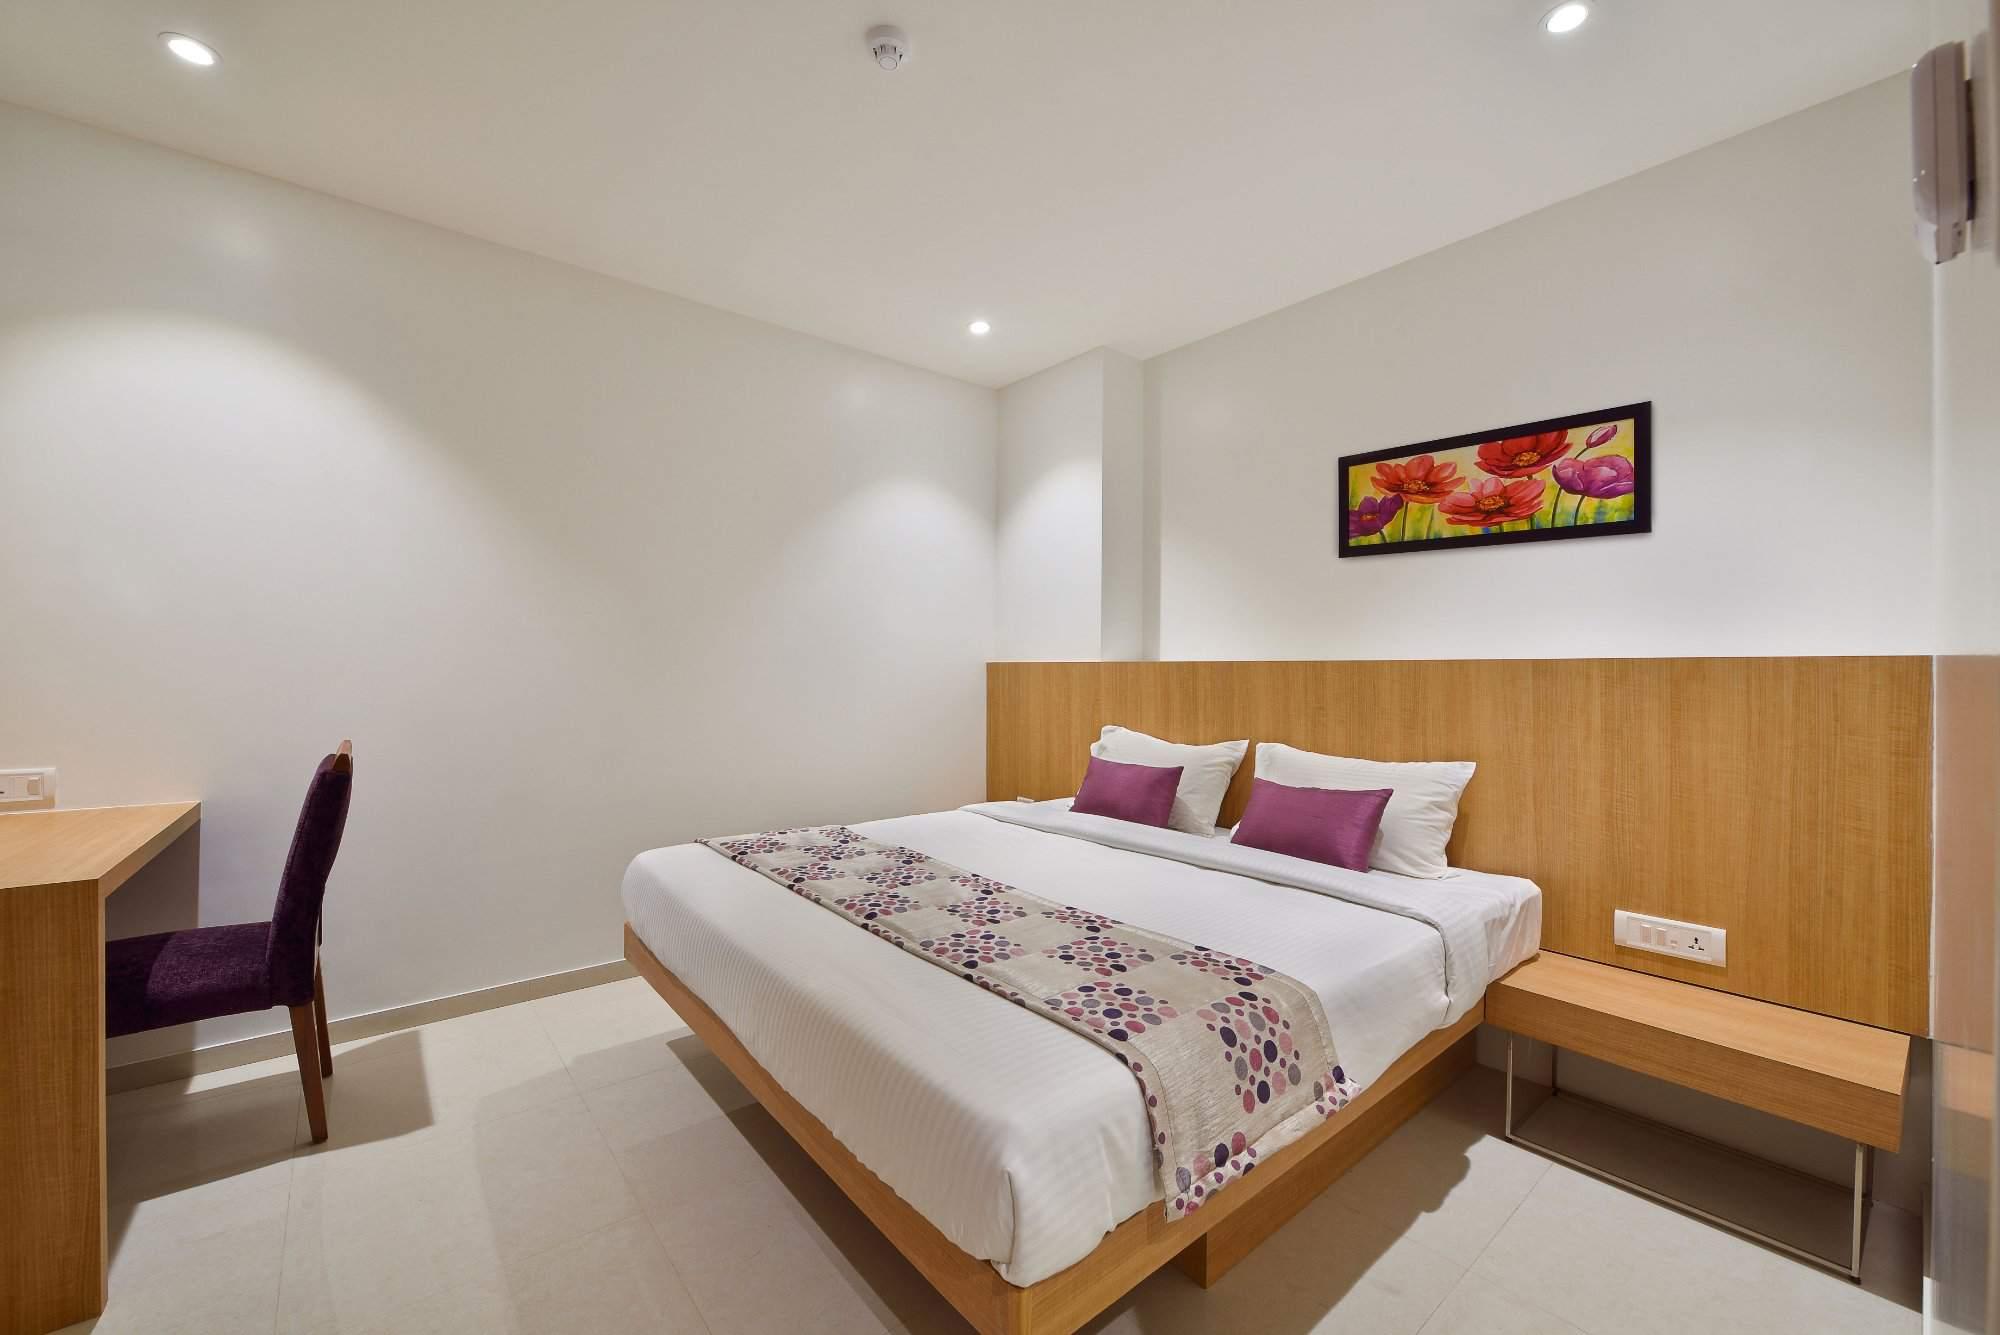 The 9 Best Hotels Near Mumbai Airport in 2019